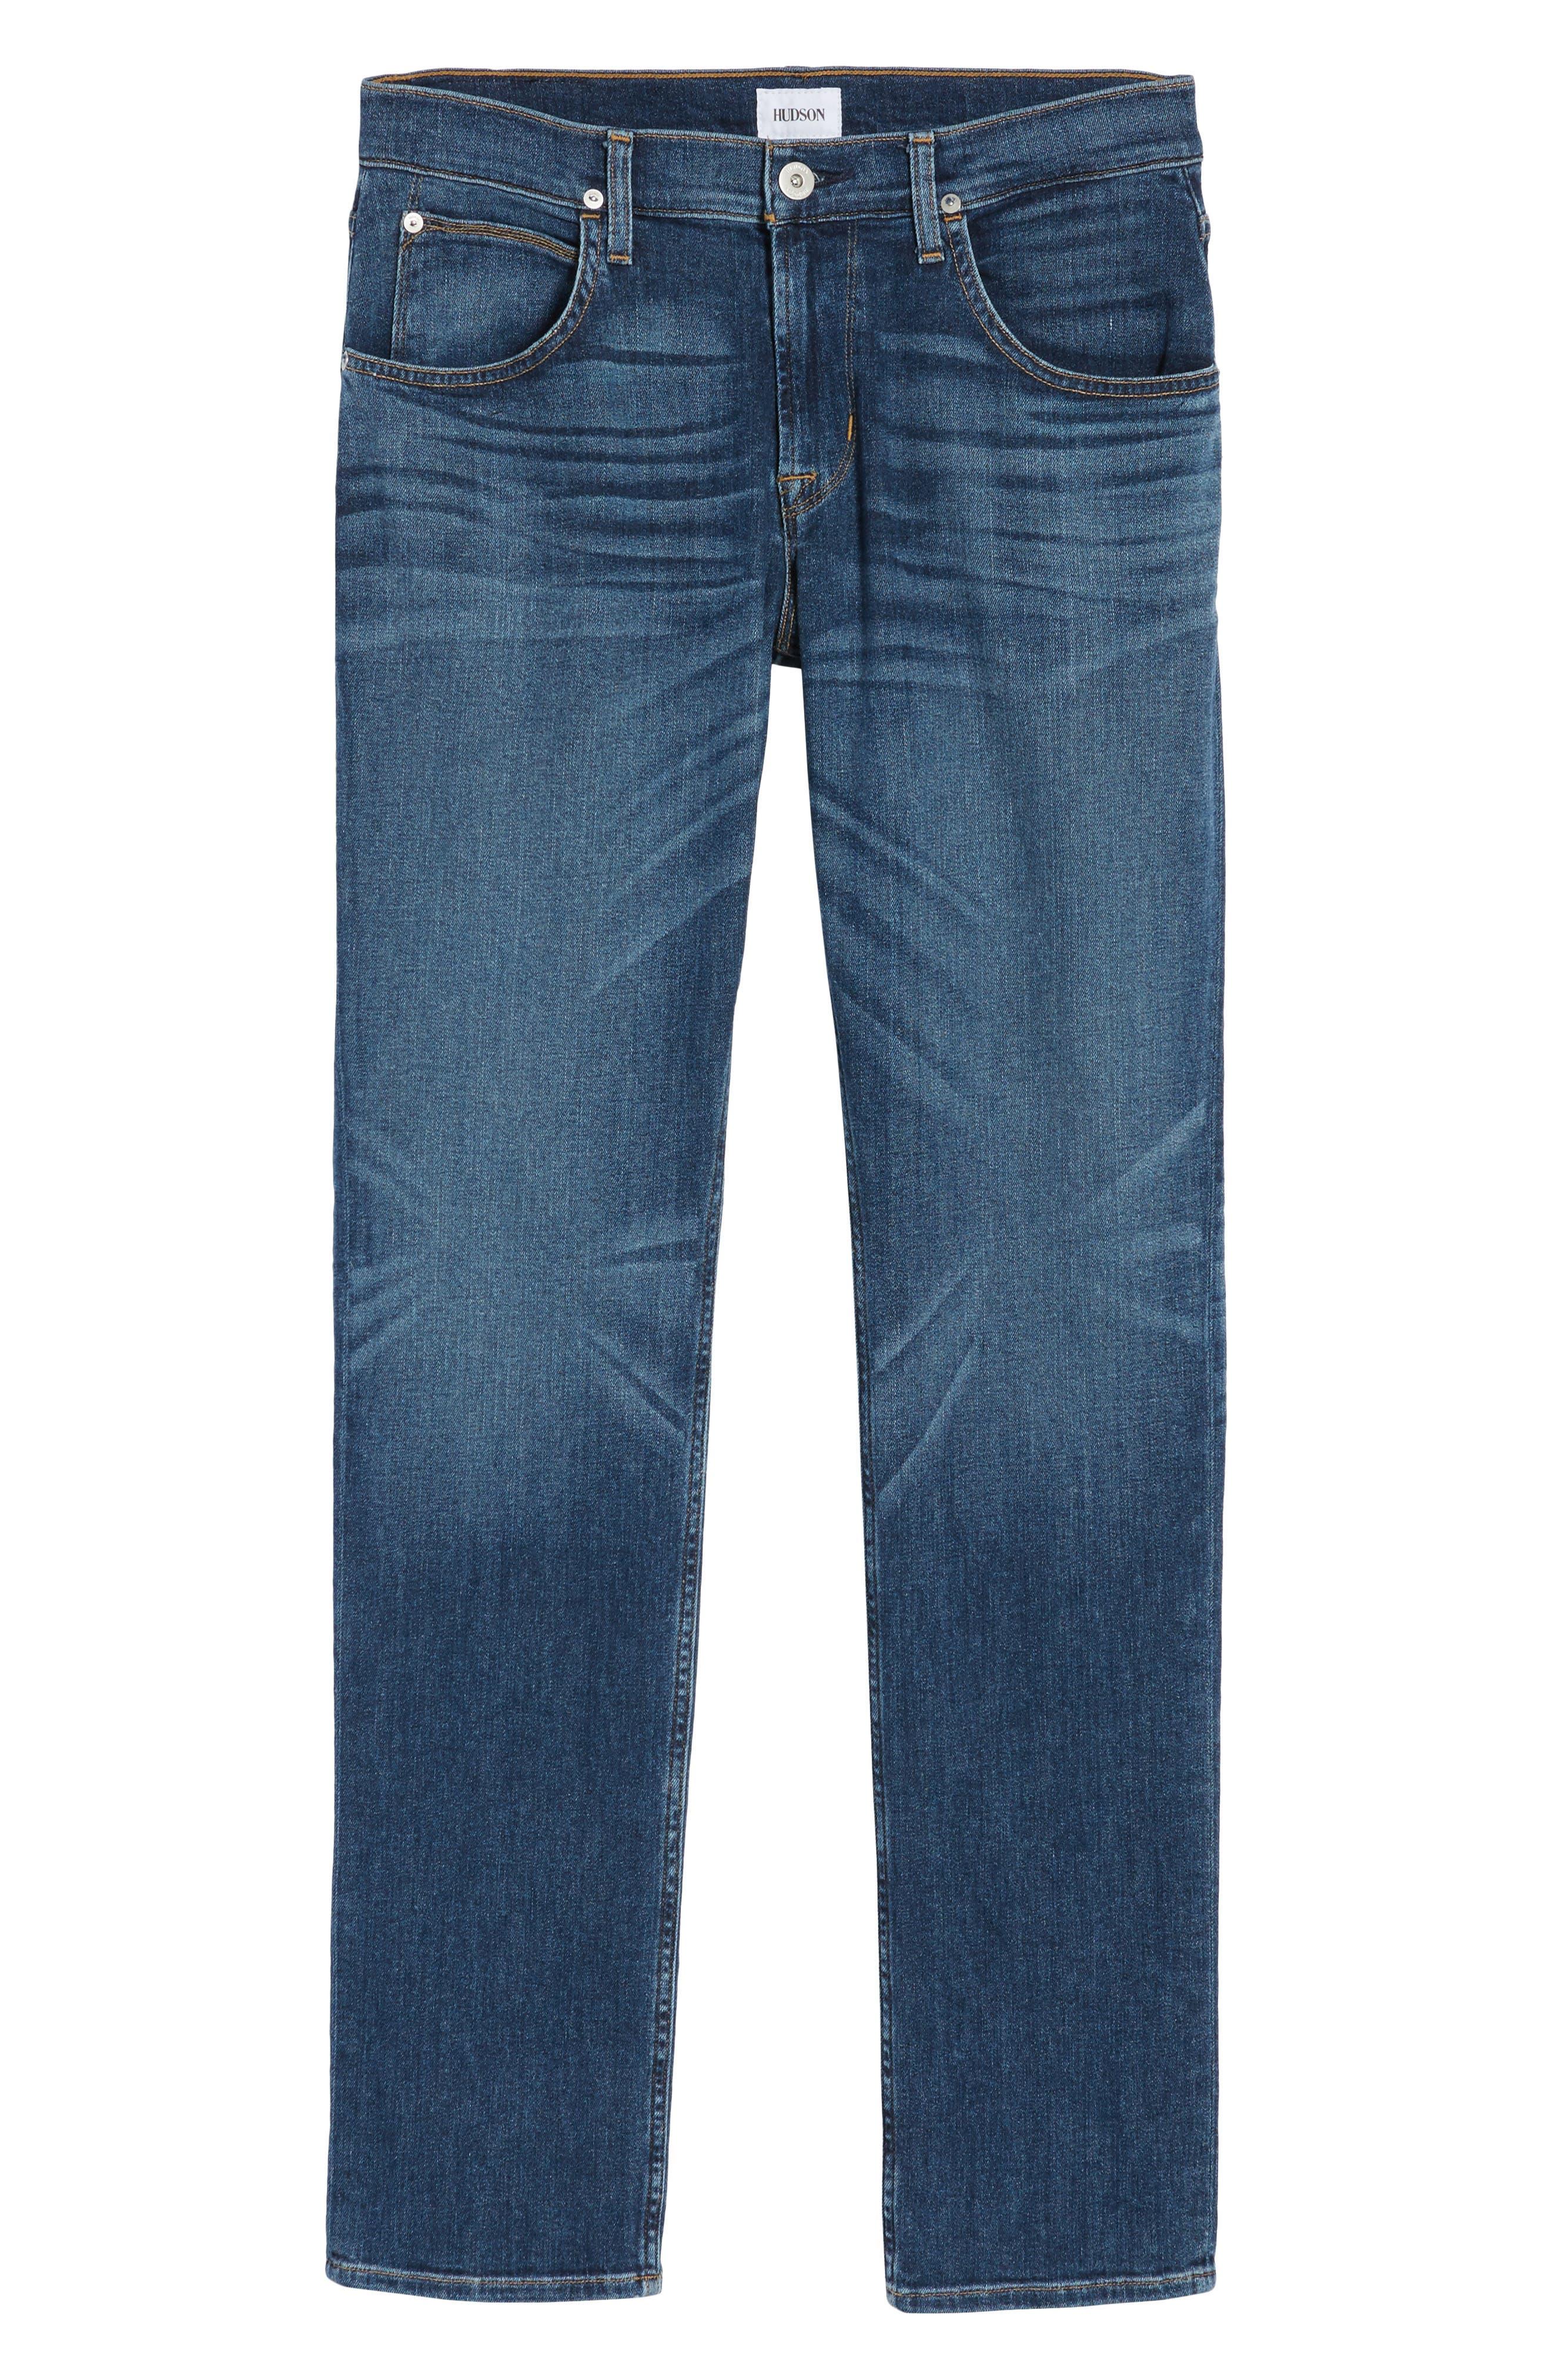 Blake Slim Fit Jeans,                             Alternate thumbnail 6, color,                             Calloway